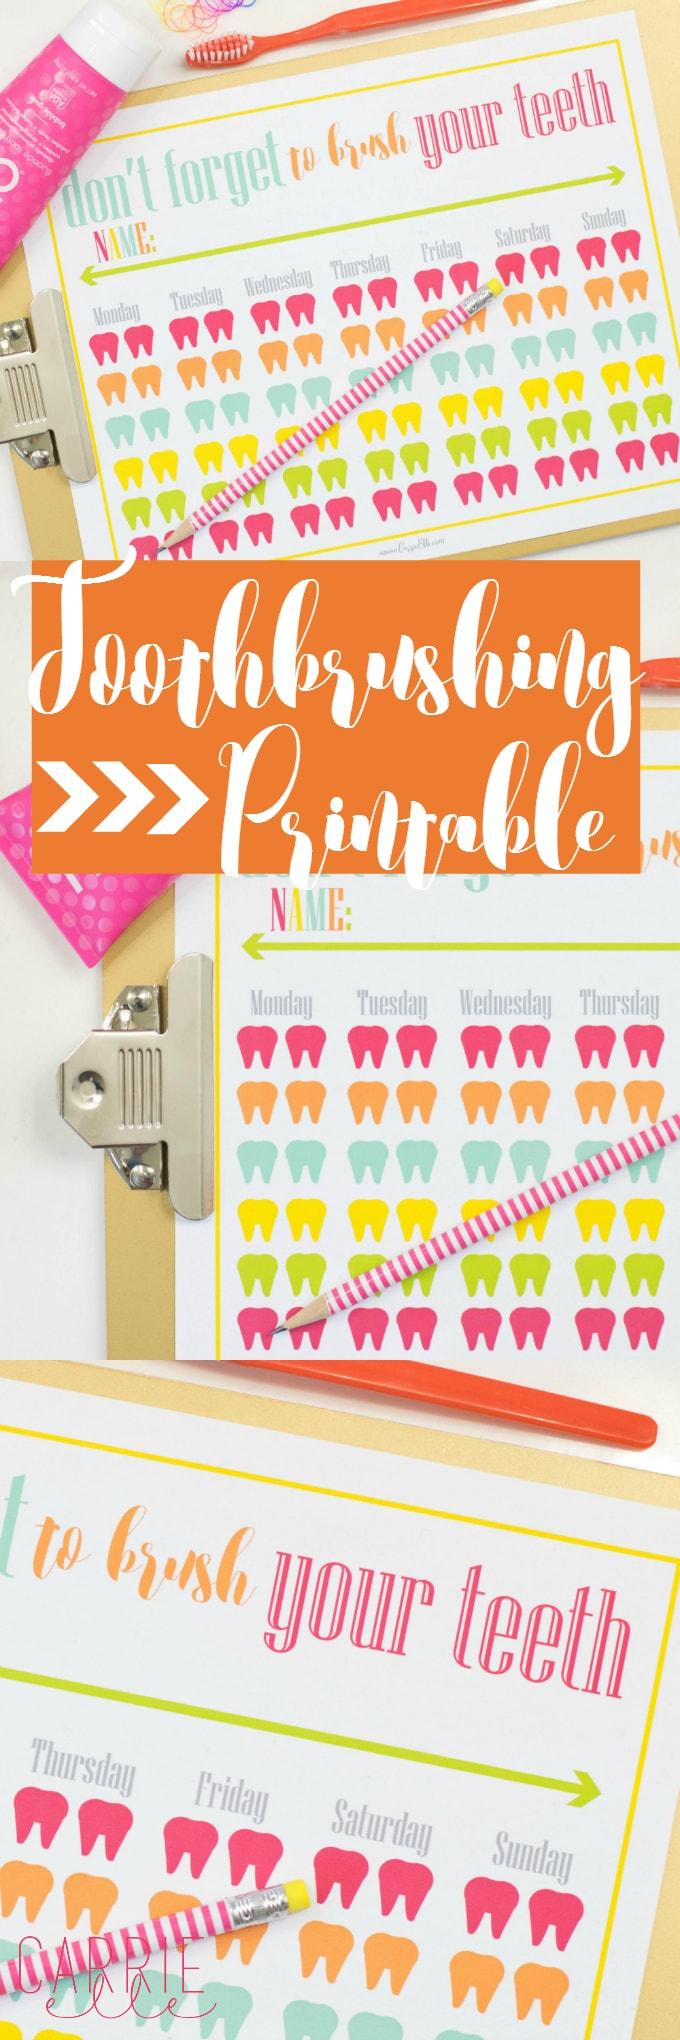 Toothbrushing Printable for Kids